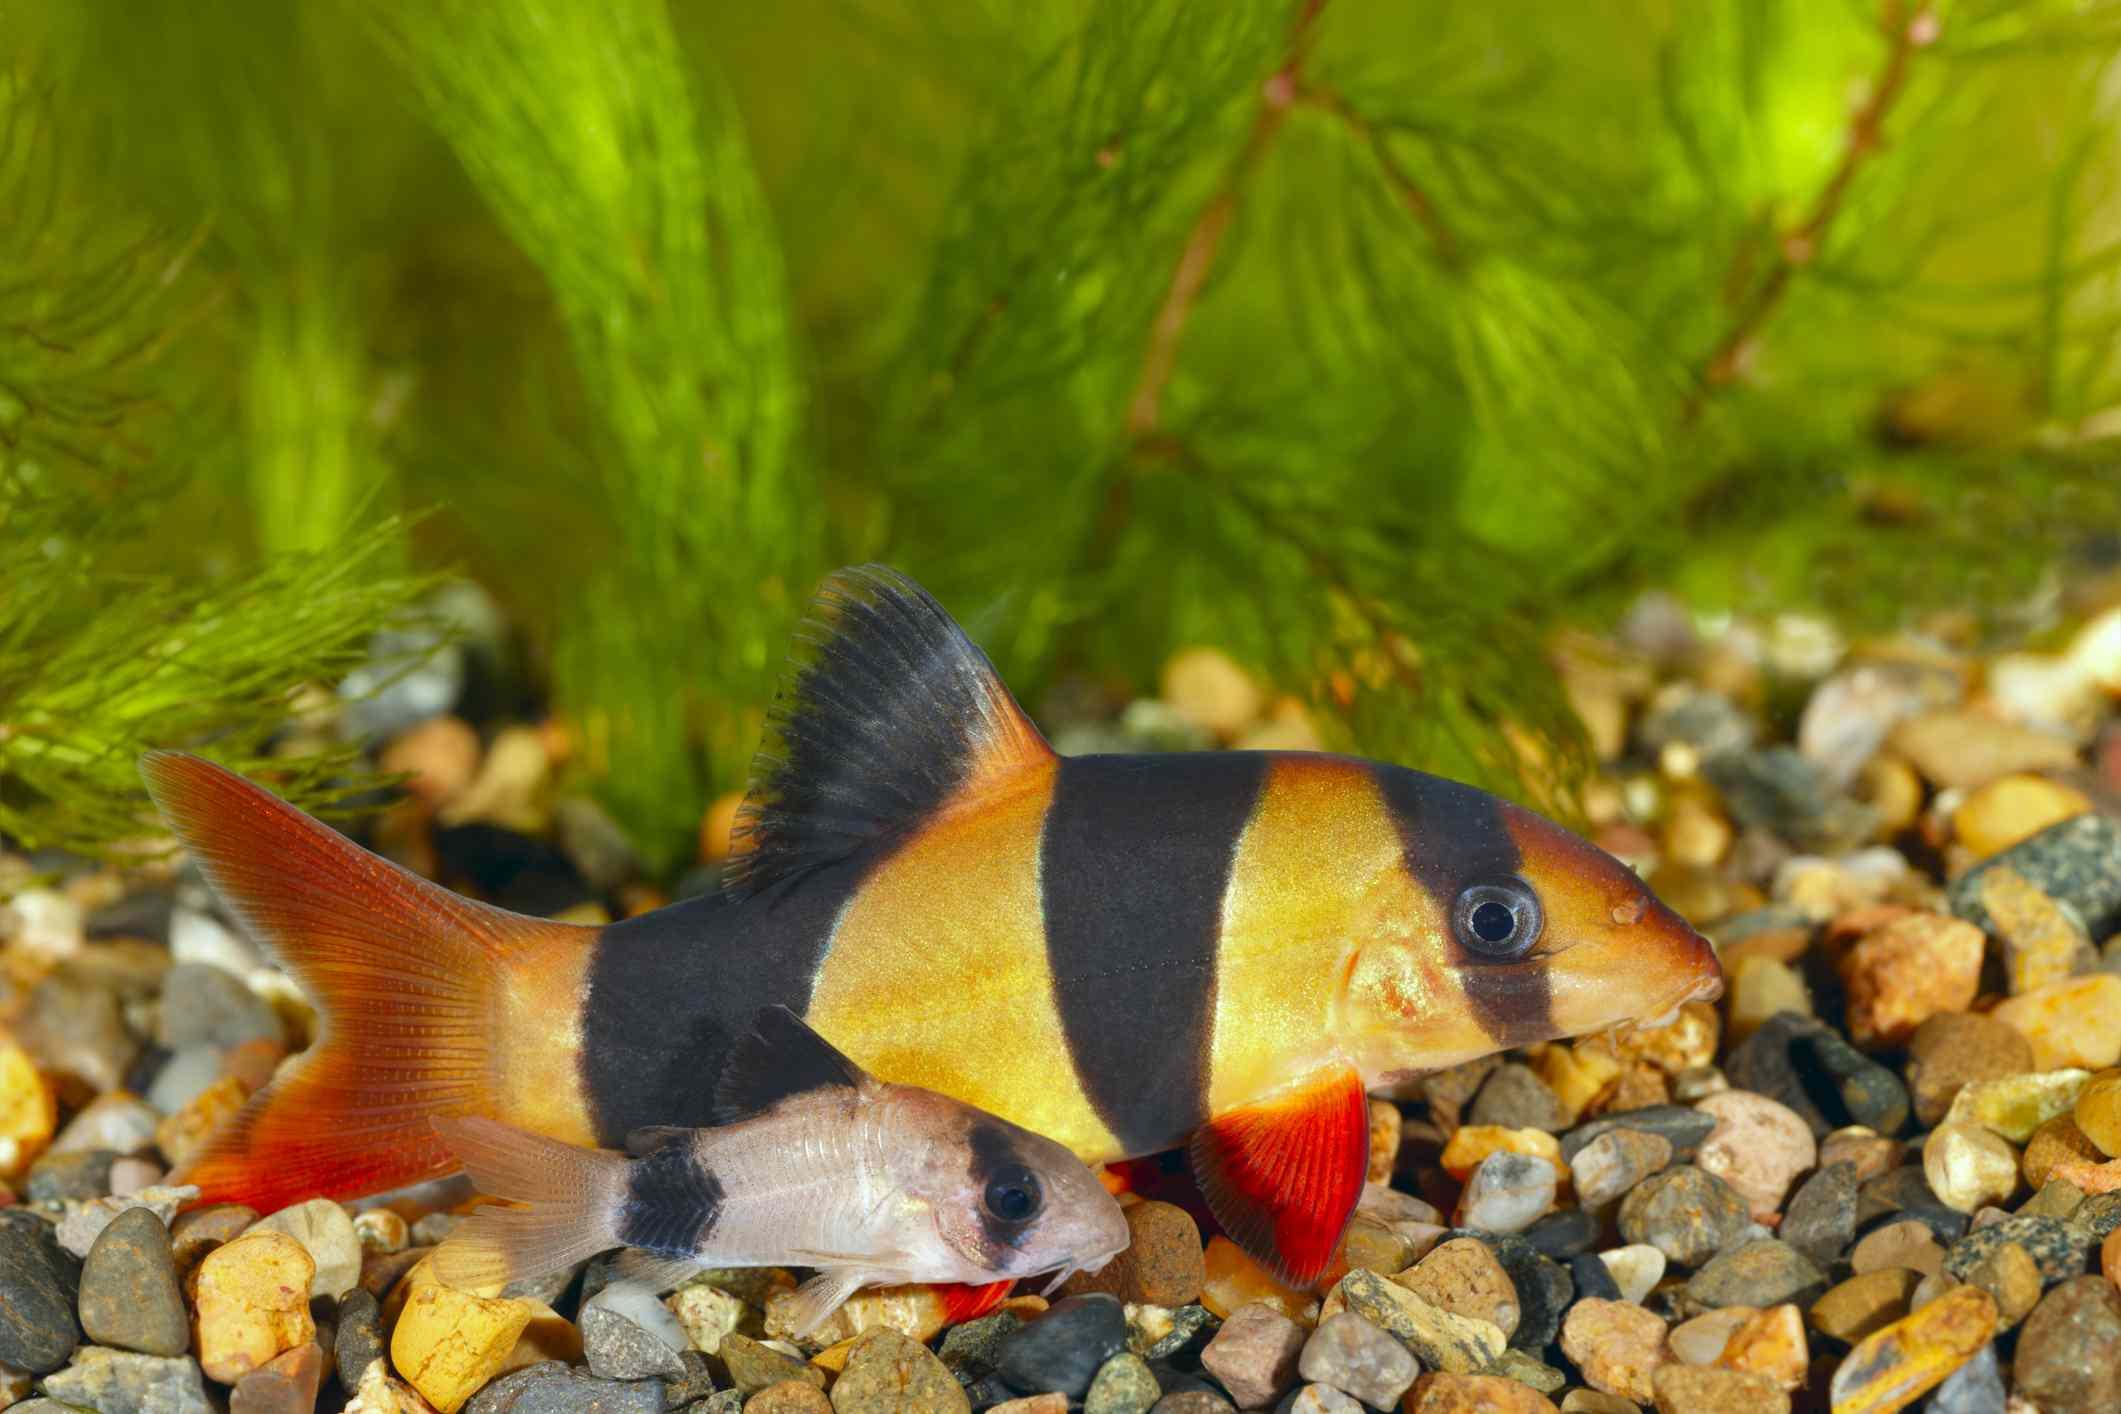 An orange and black-striped cory catfish on a rocky bottom.